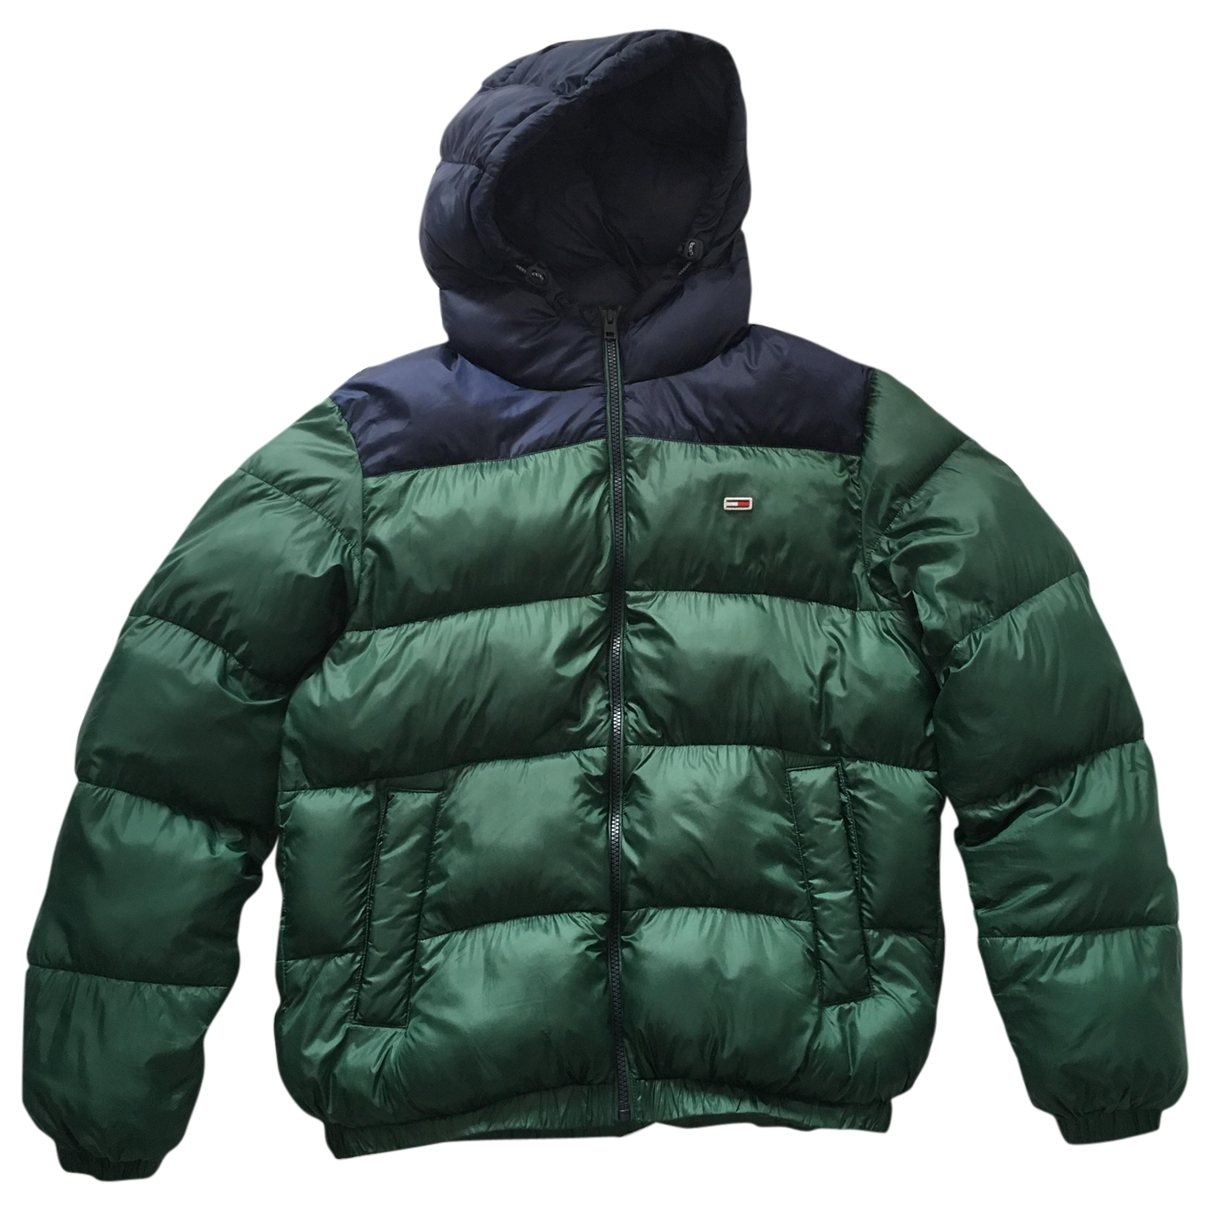 Tommy Hilfiger \N Green jacket for Women S International